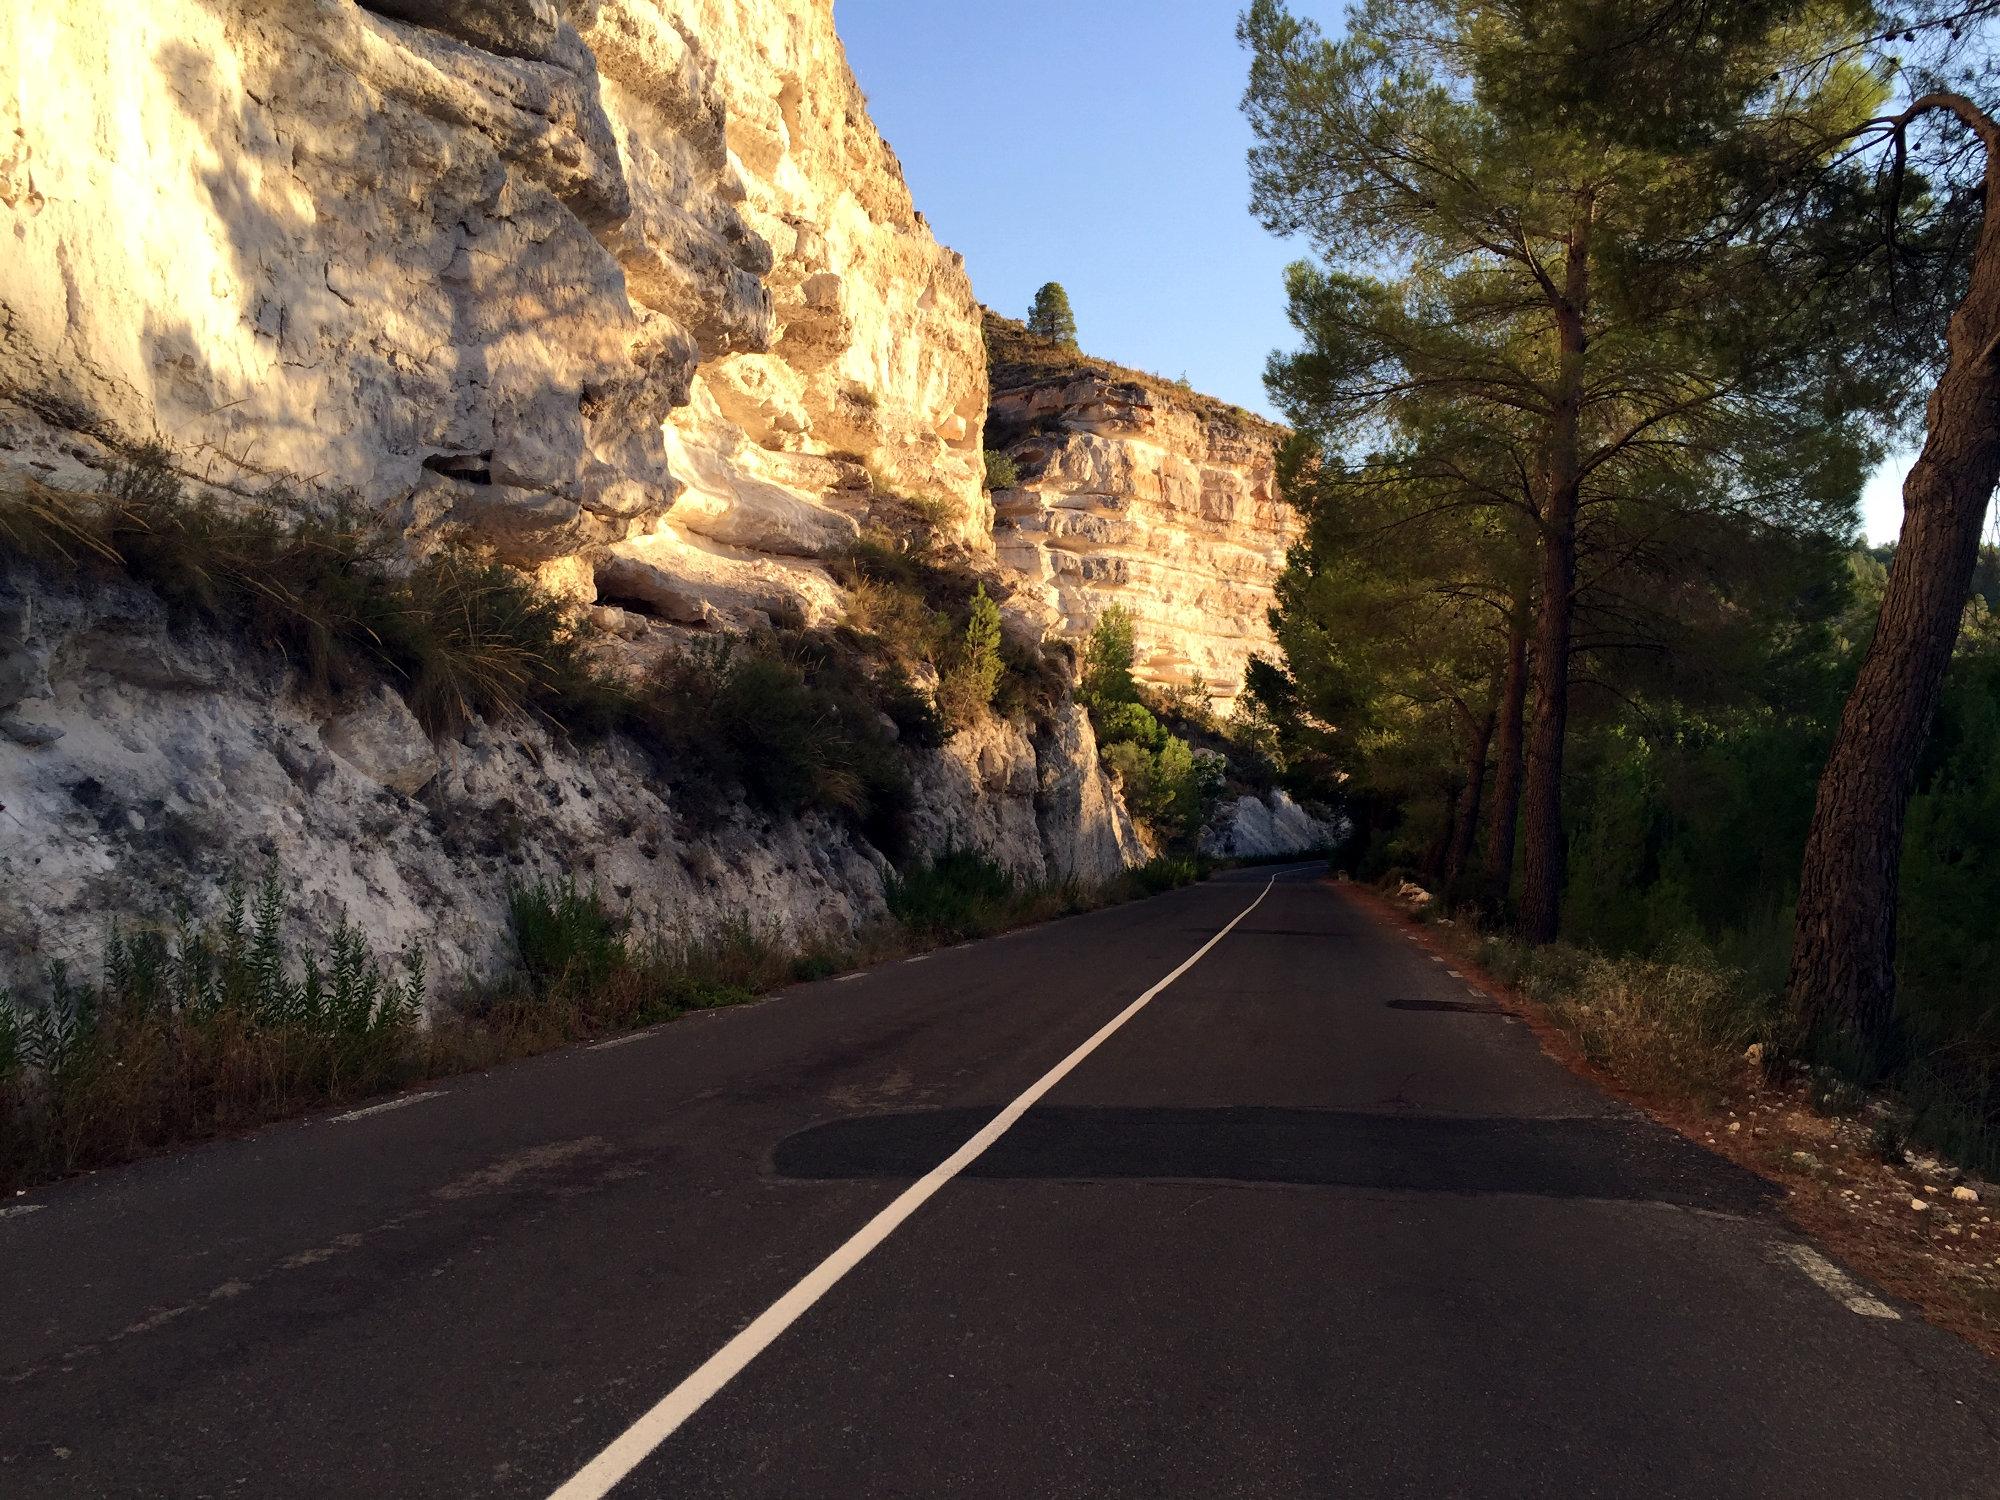 La route de la Ribera de Cubas en direction de Jorquera longe la falaise. Grandiose !